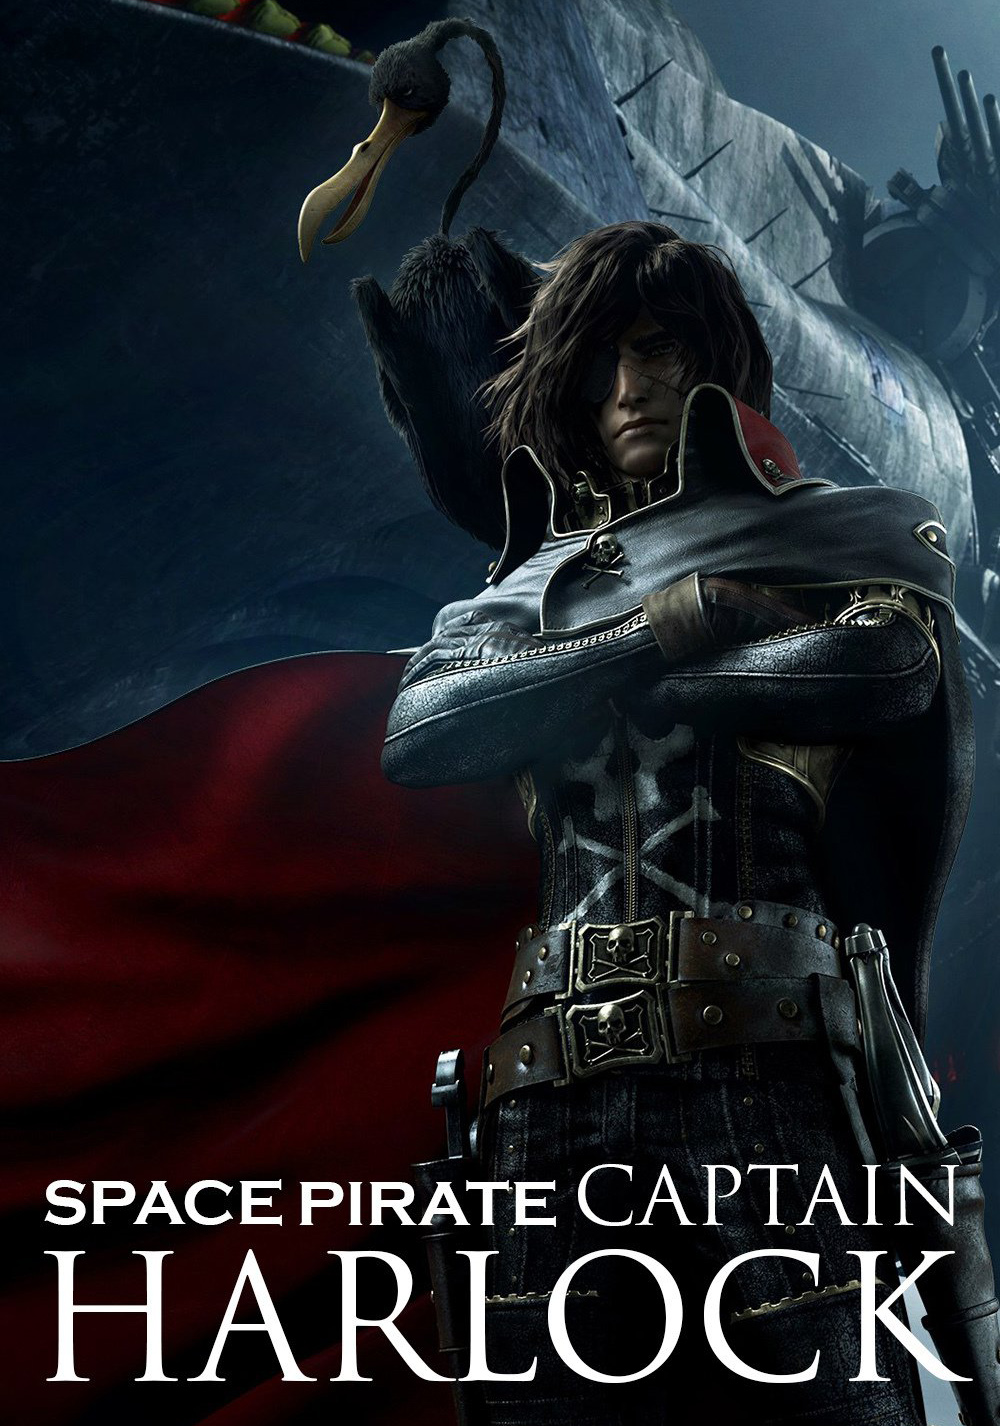 Space Pirate Captain Harlock Serie